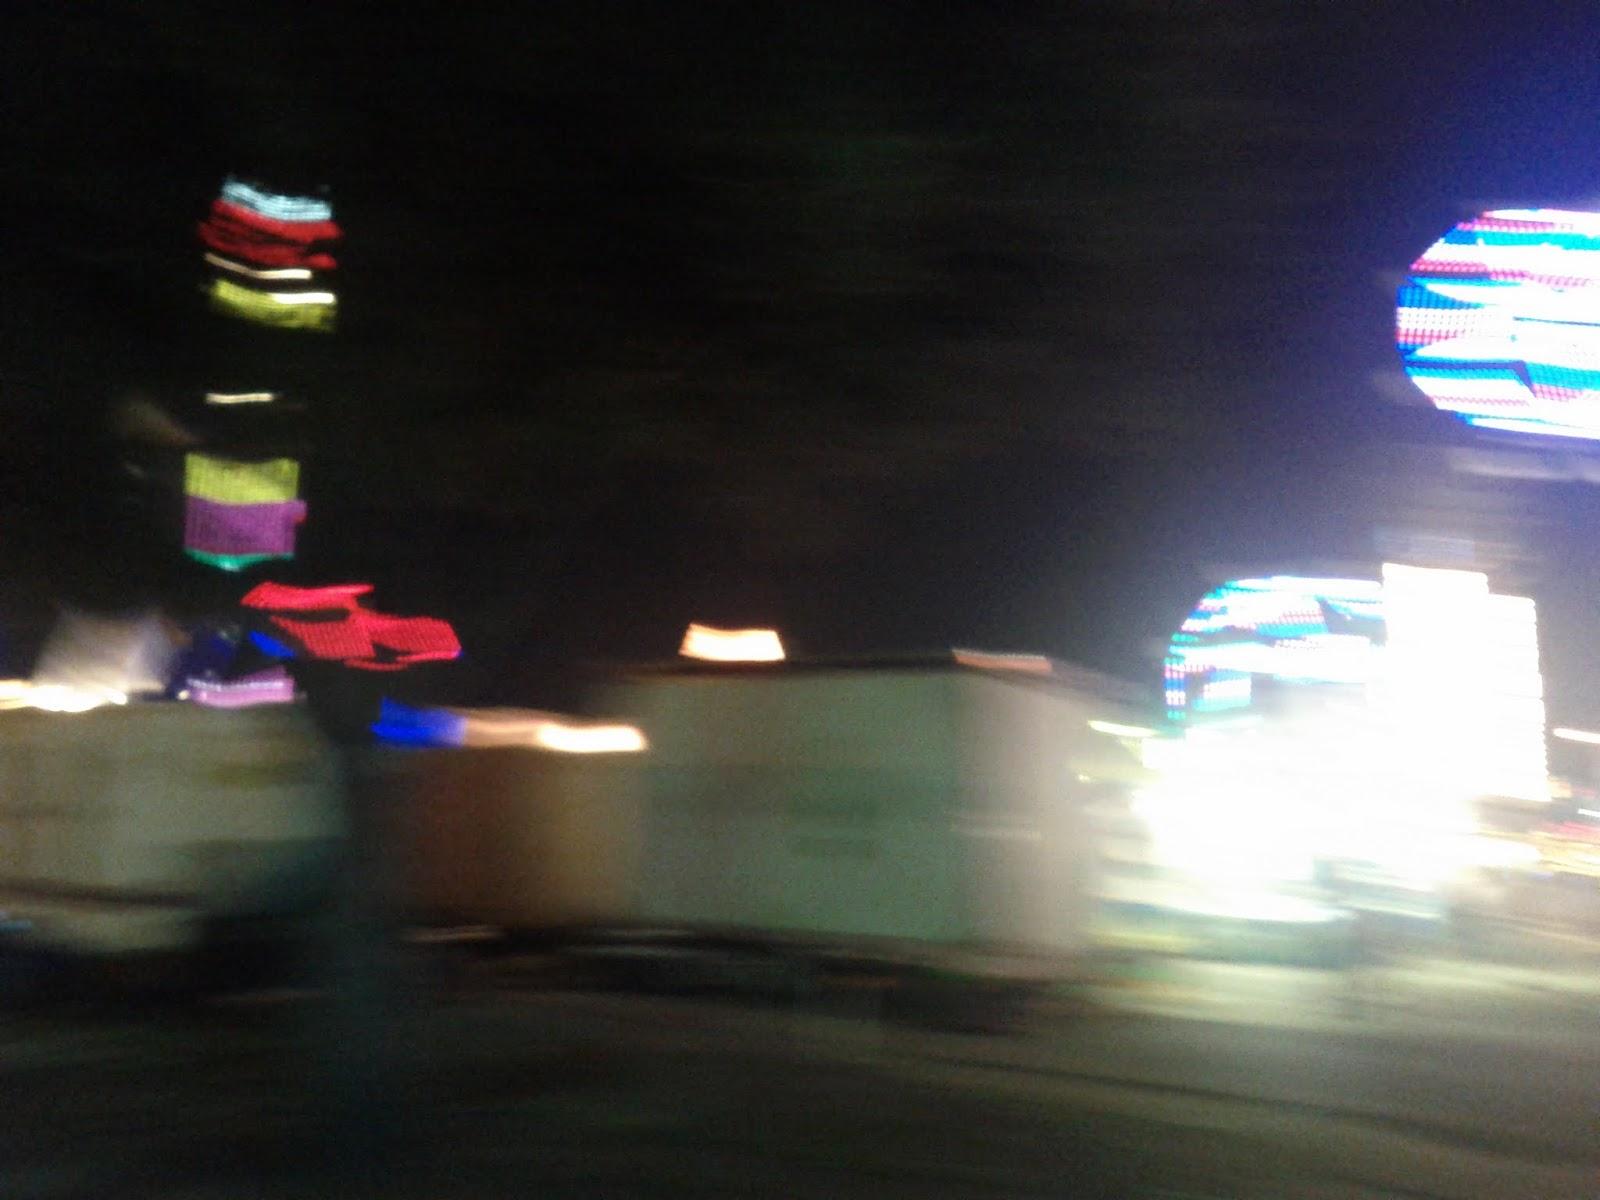 Fort Bend County Fair 2012 - IMG_20121006_194721.jpg